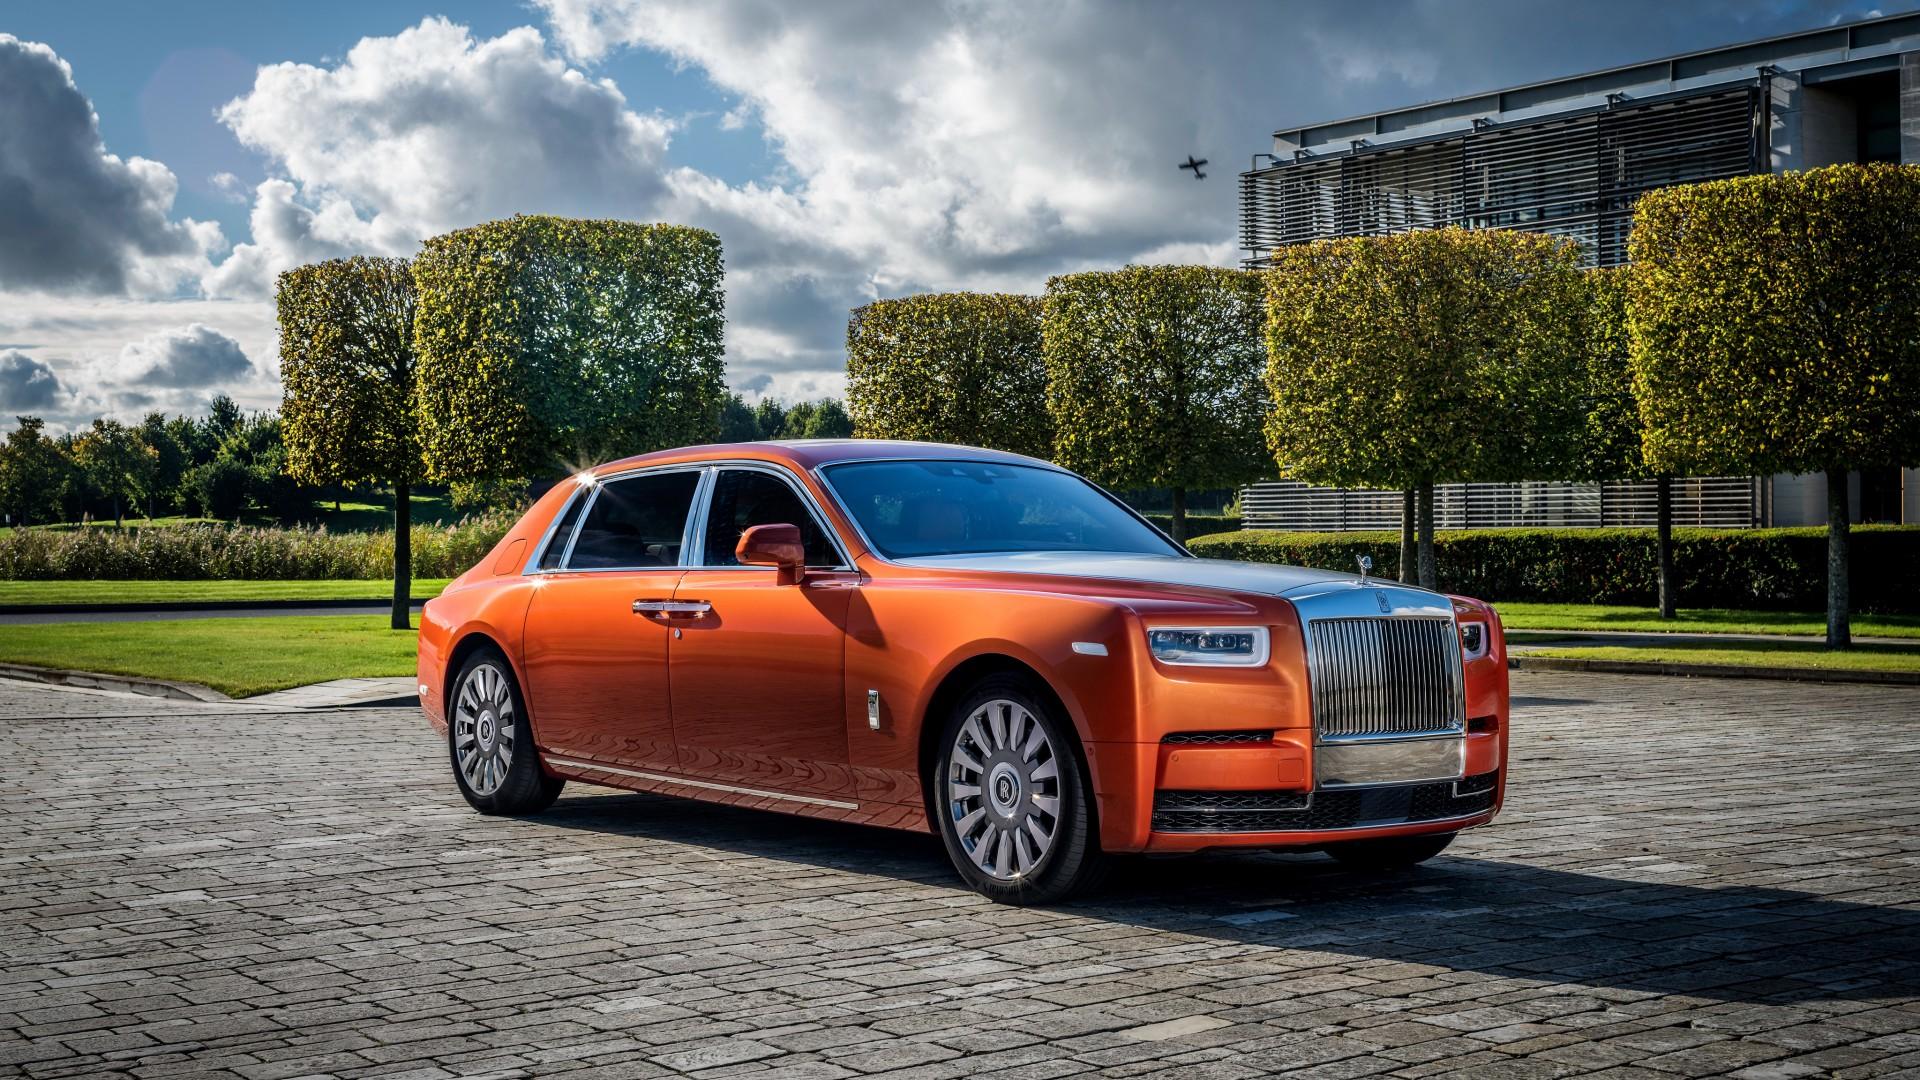 2017 Rolls Royce Phantom Ewb Star Of India 4k Wallpaper